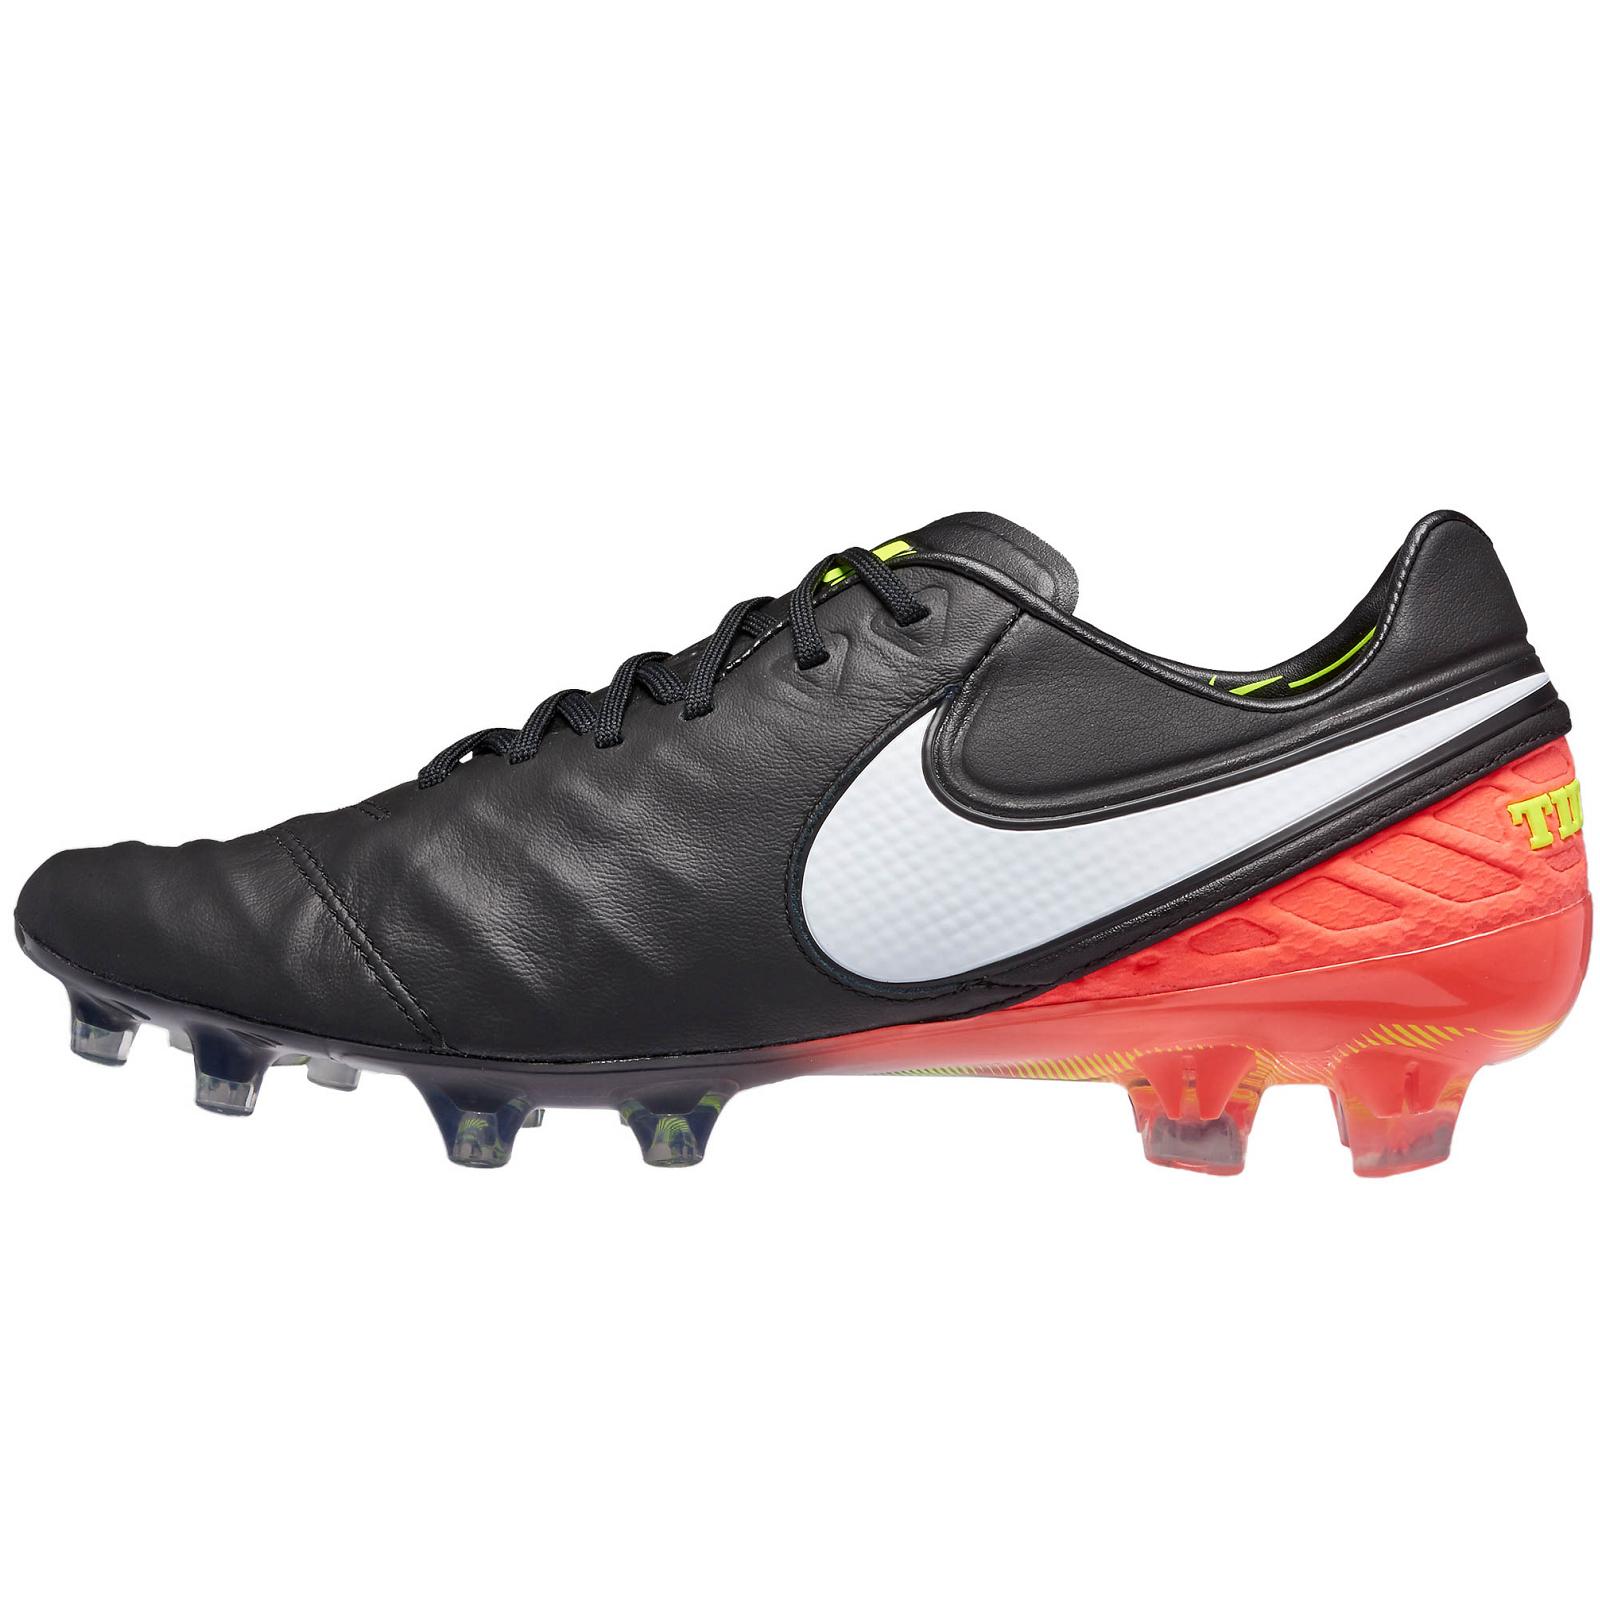 sports shoes d05a0 37e26 Nike Tiempo Legend VI FG Fußballschuhe schwarz/weiss/orange 819177-018